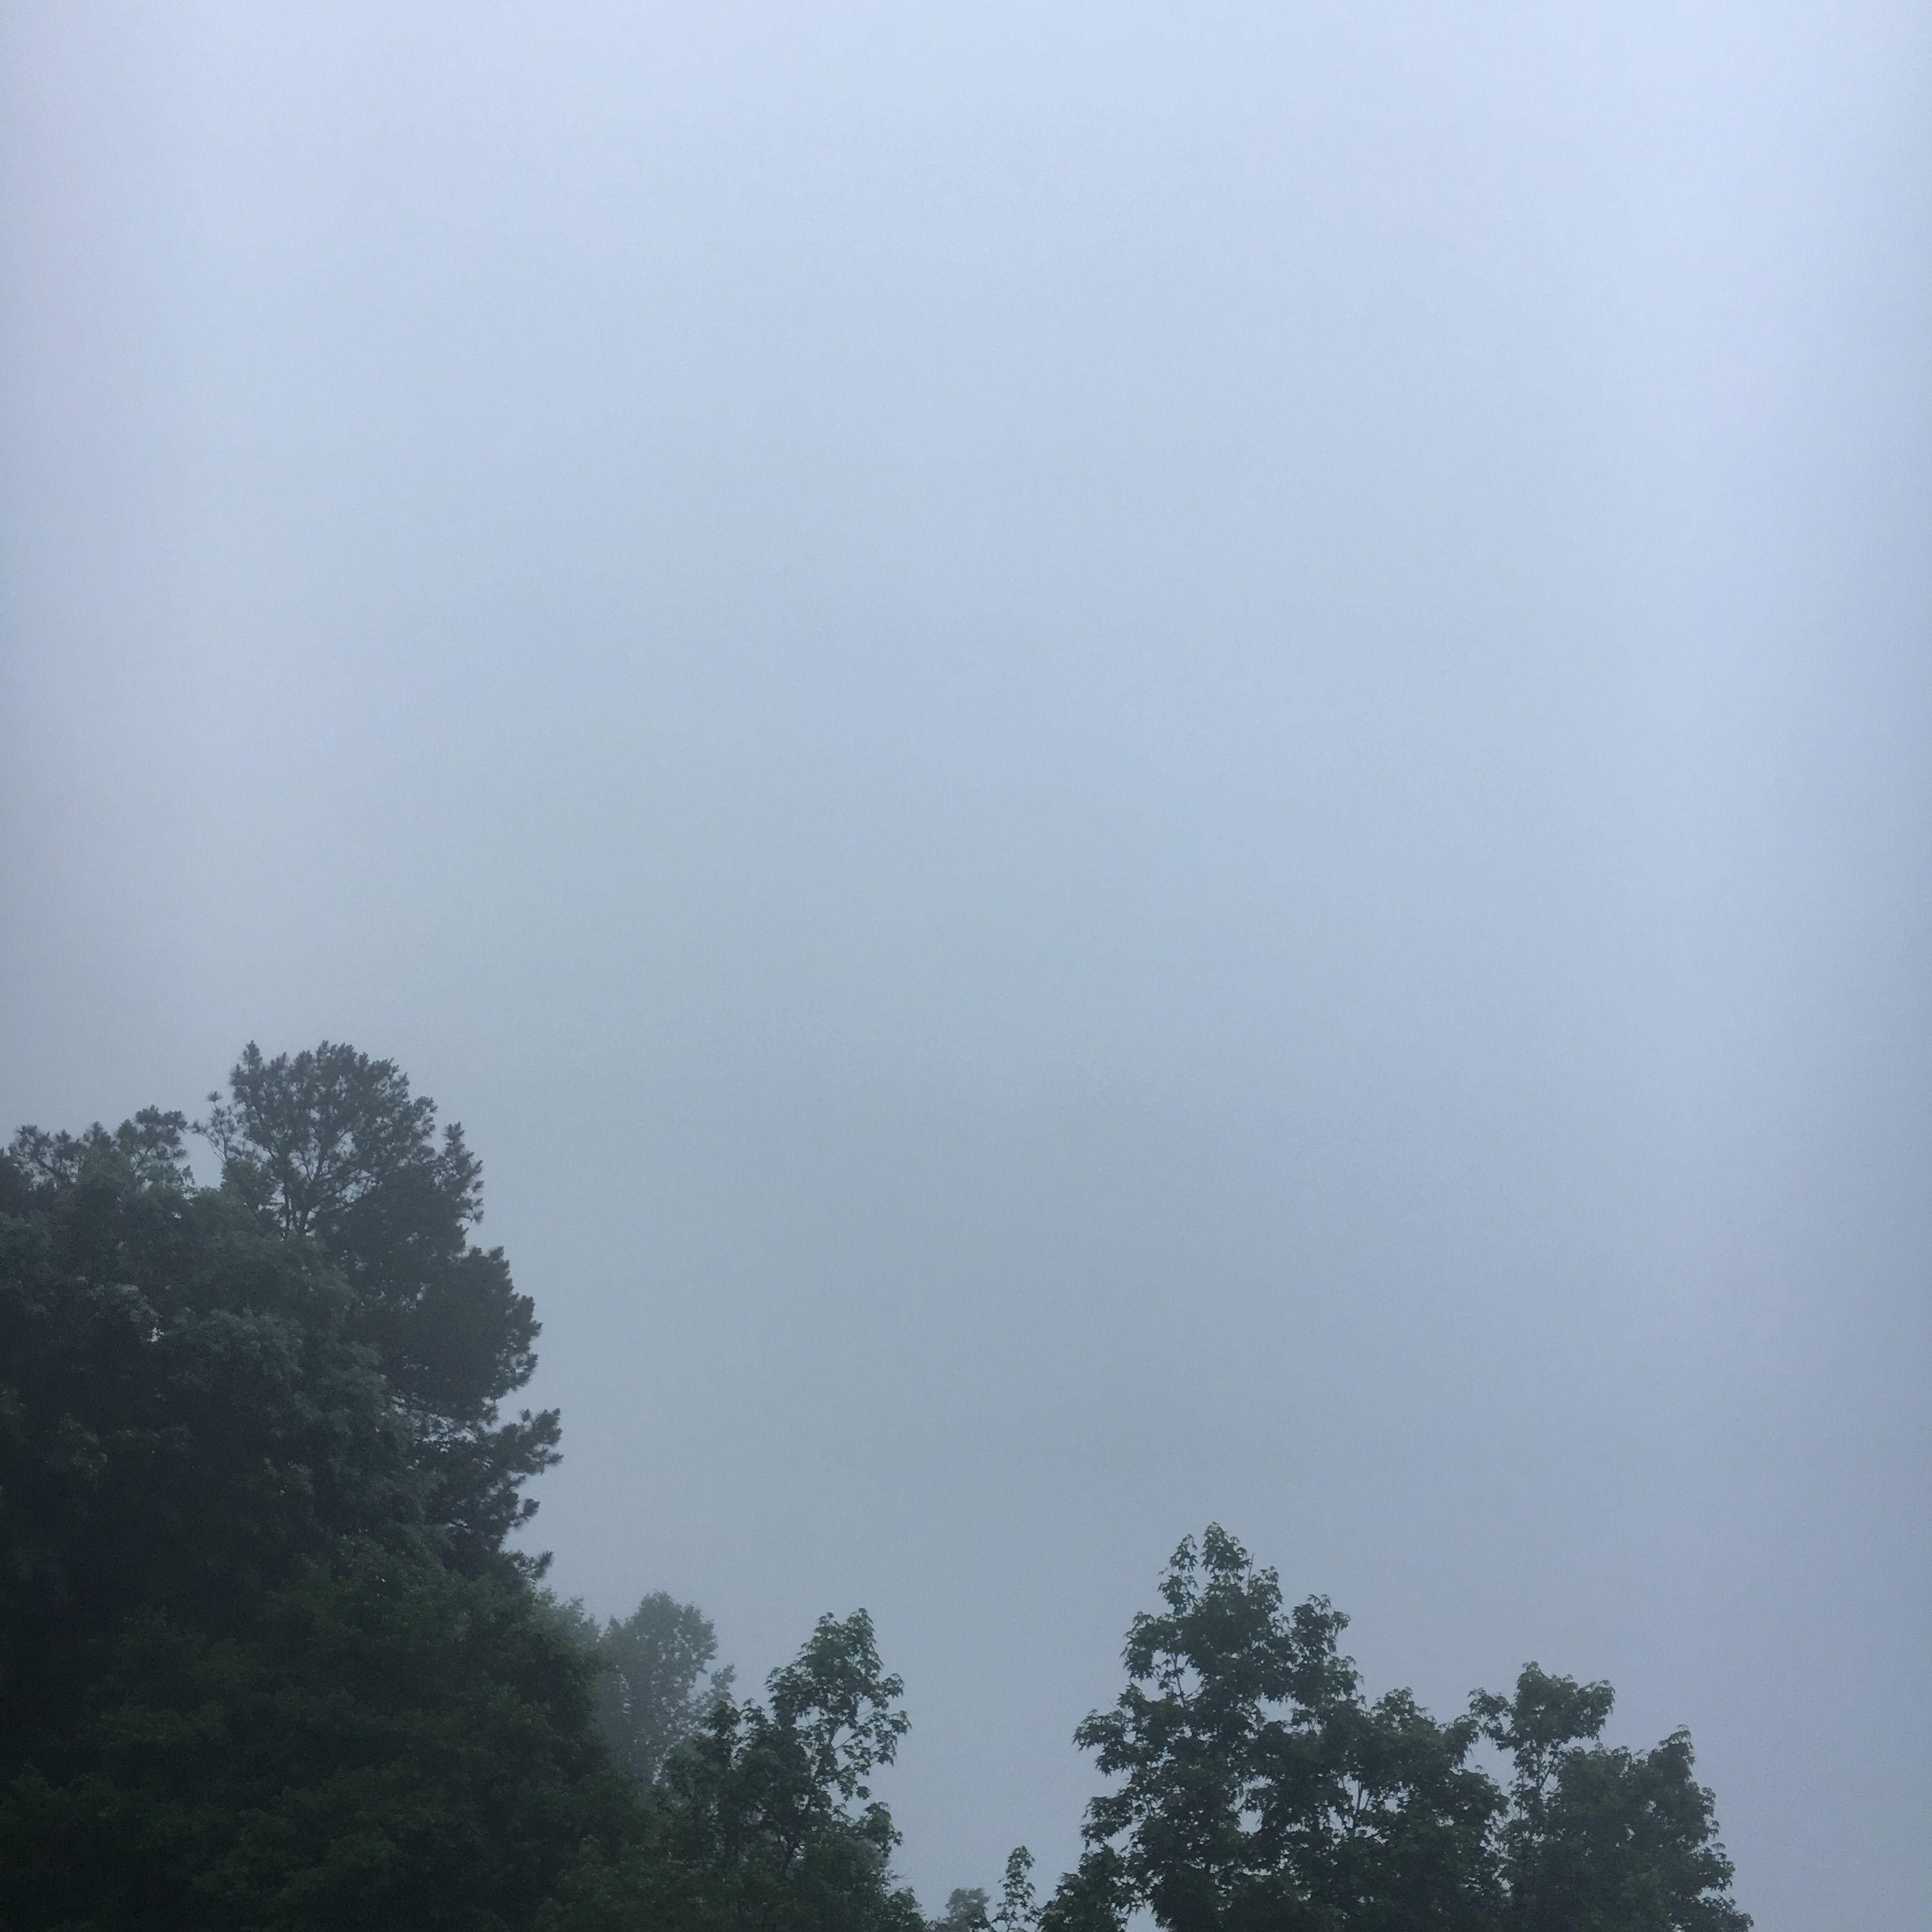 Foggy Sky Aesthetic Dark Sky Aesthetic Rainy Sky Dark Aesthetic